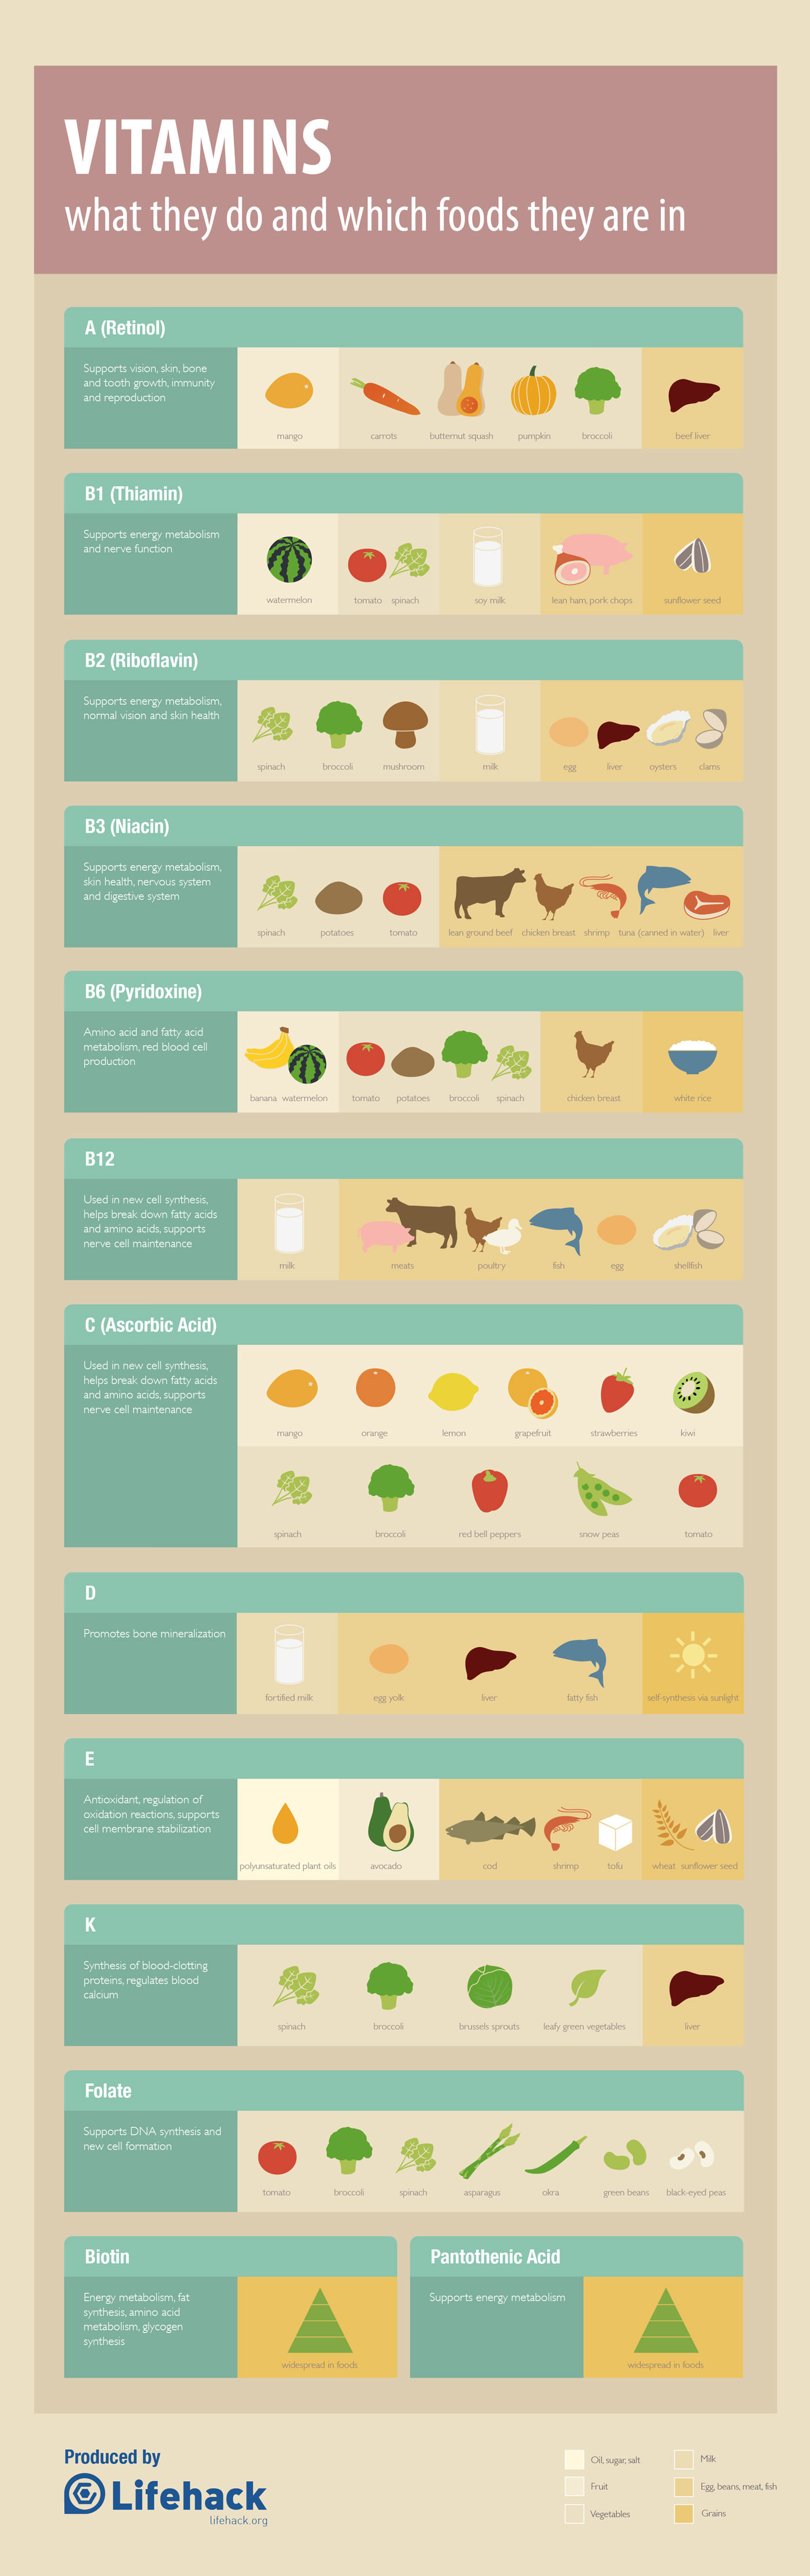 Vitamins Cheat Sheet Infographic